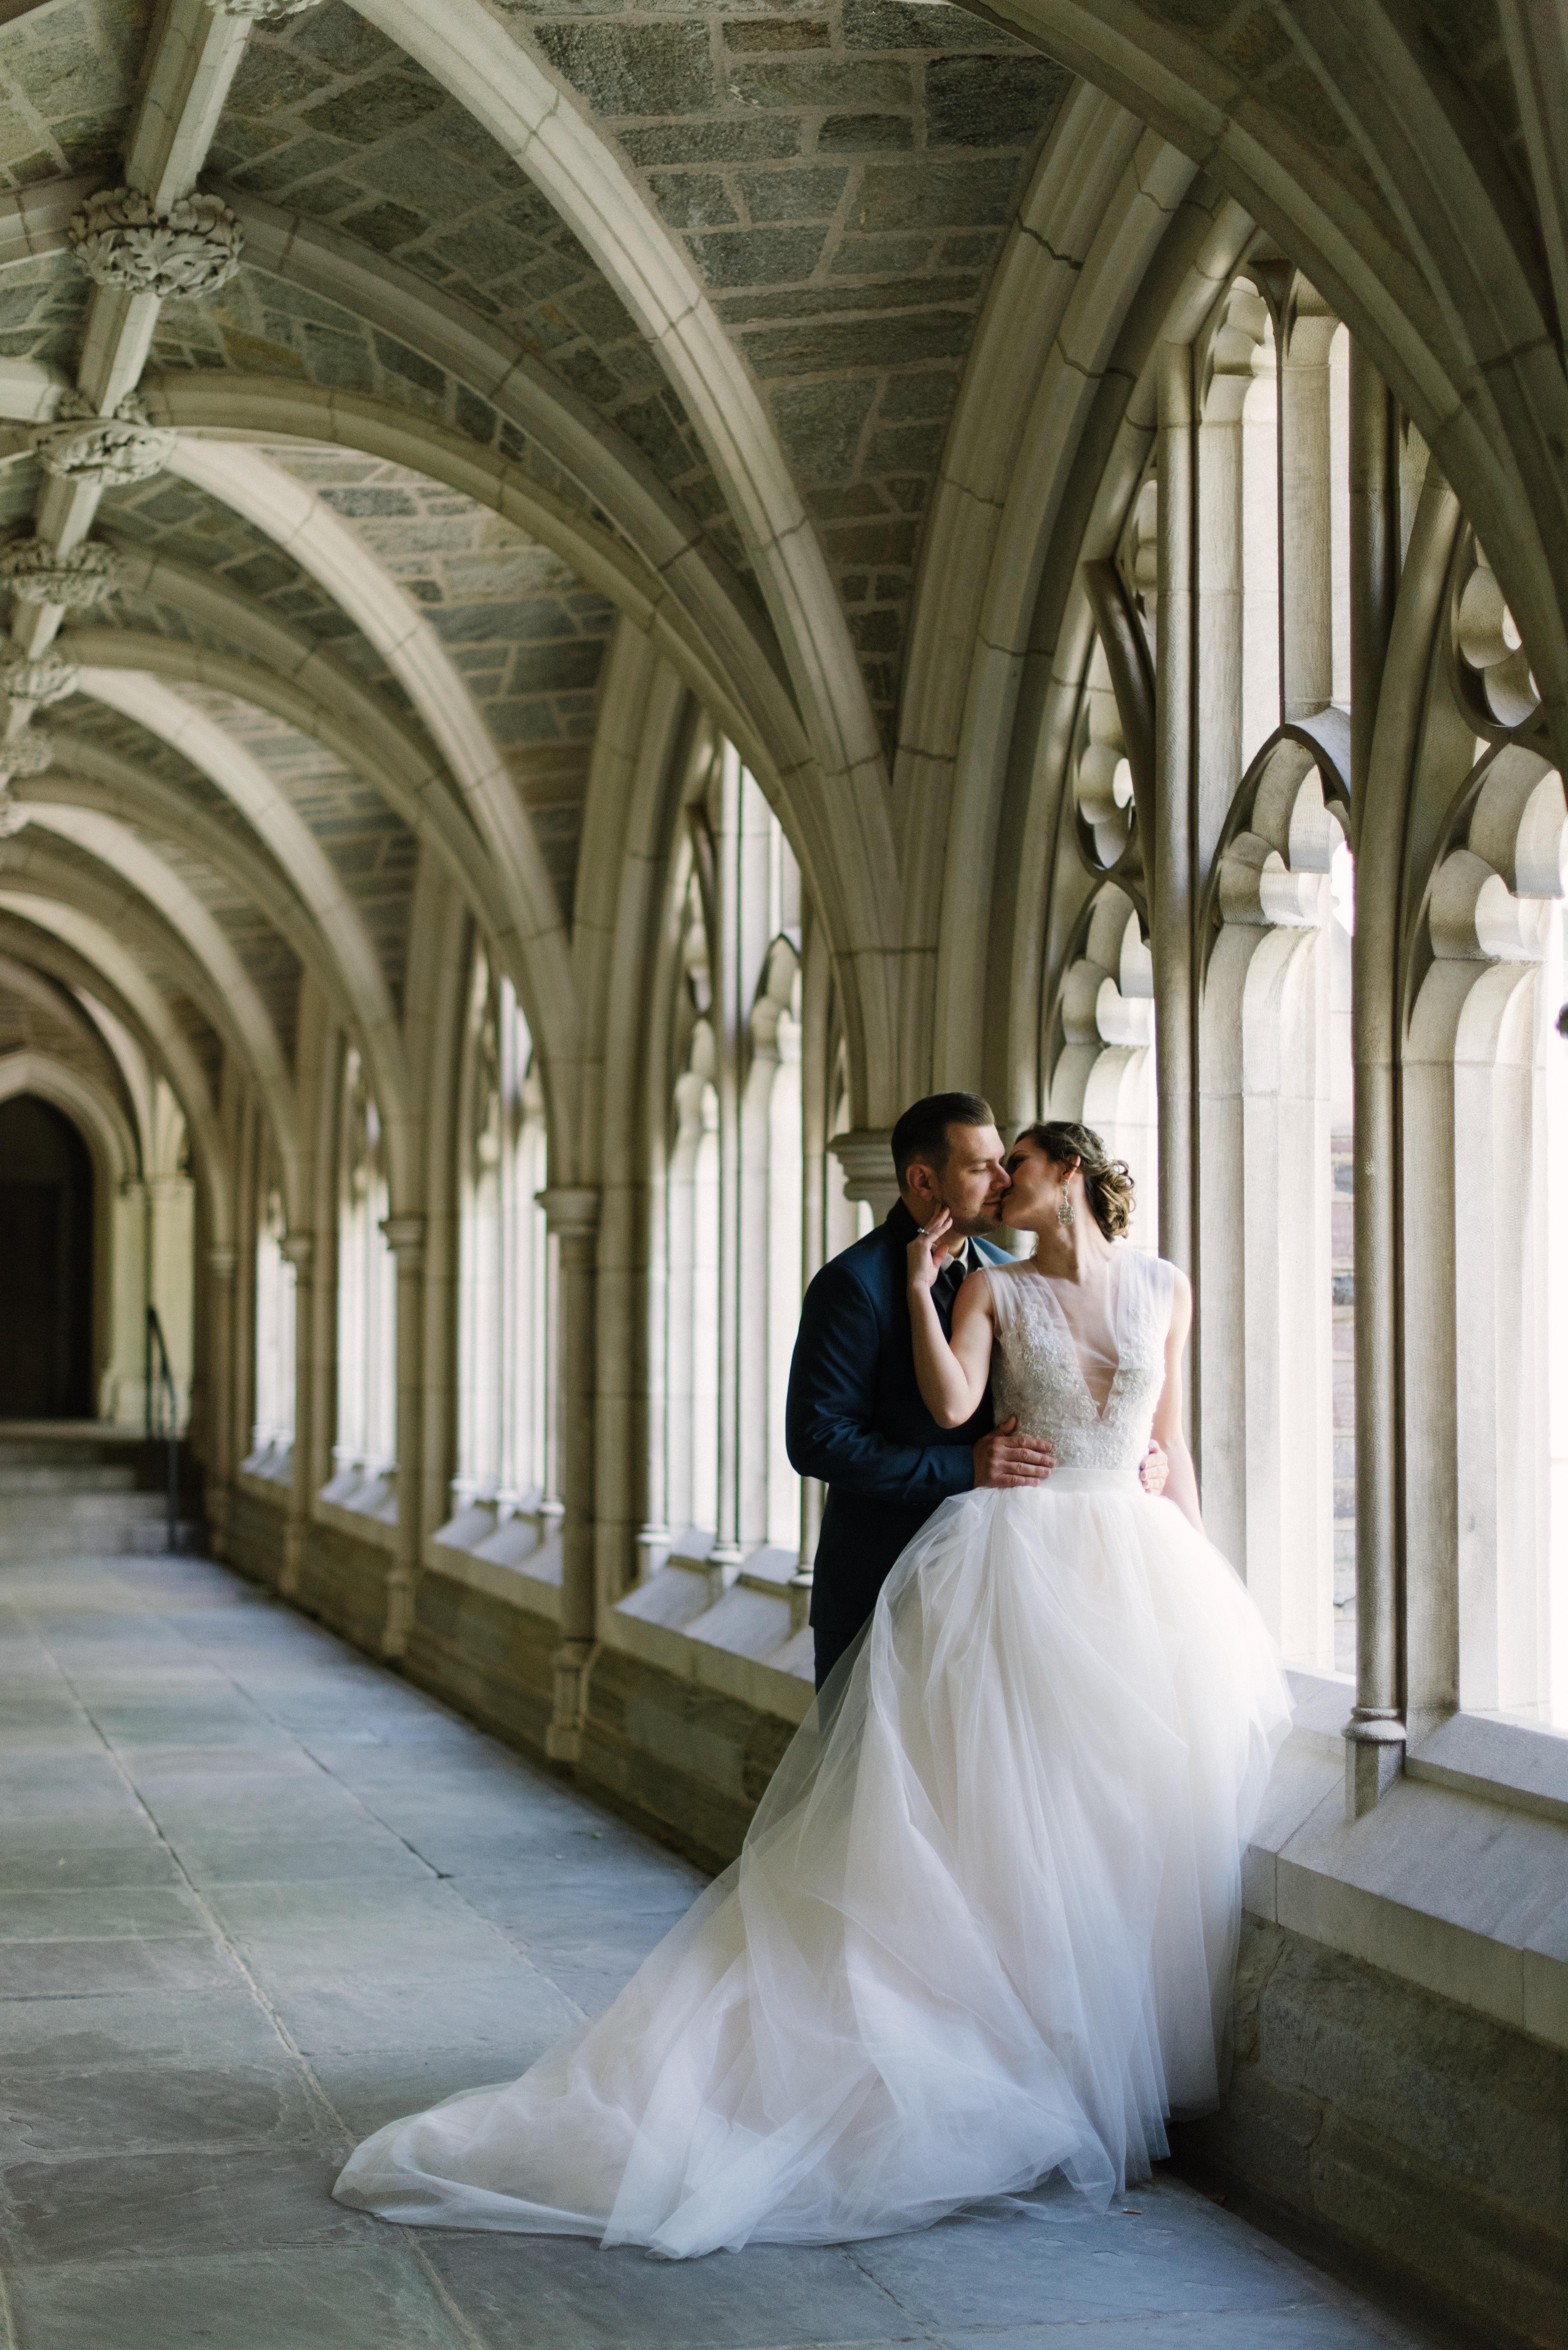 Romantic European Wedding Portrait